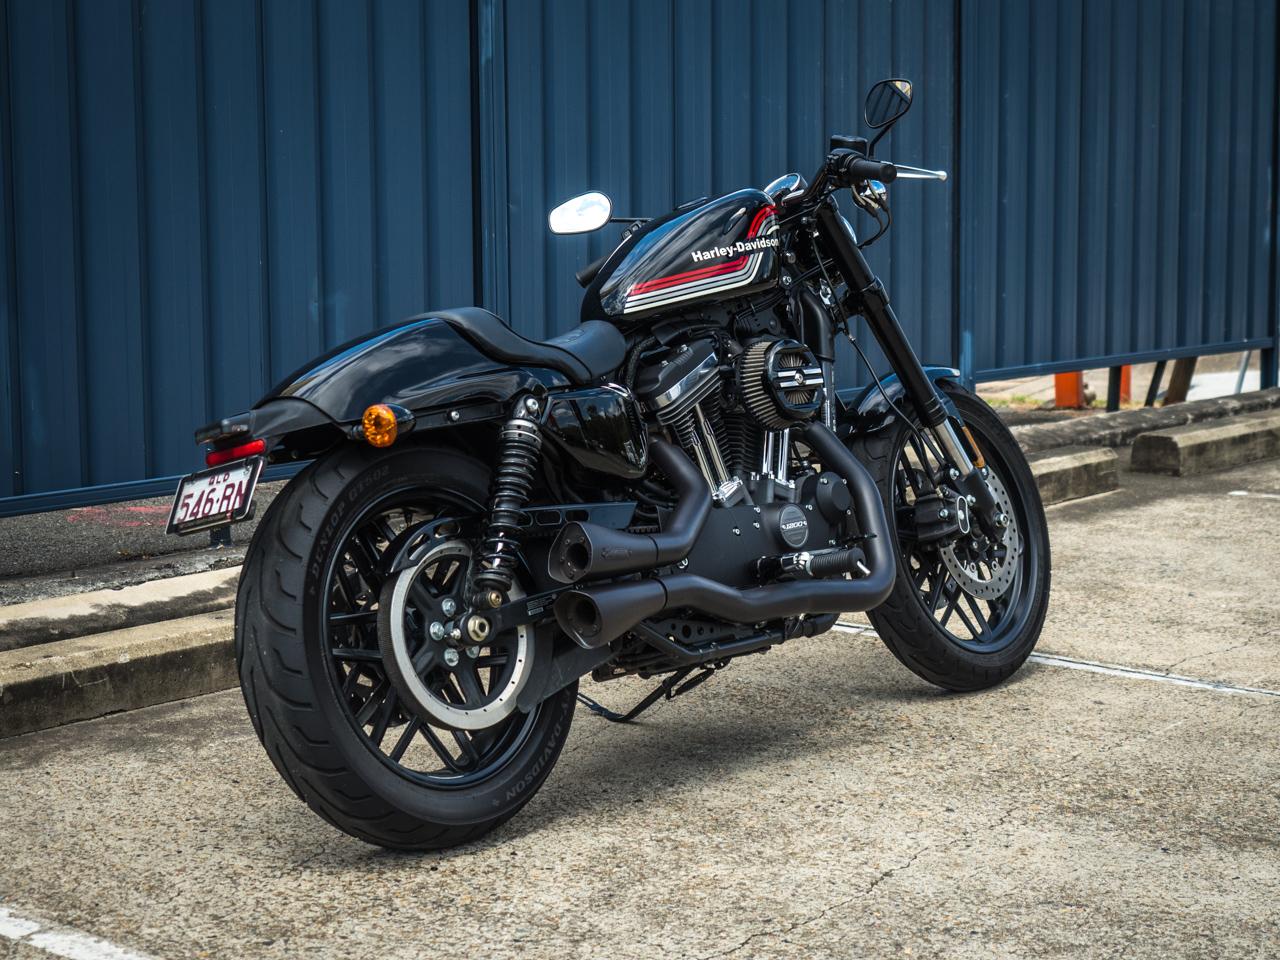 Harley Davidson Bike Covers >> Harley-Davidson XL1200CX Roadster 2016 - Black ...